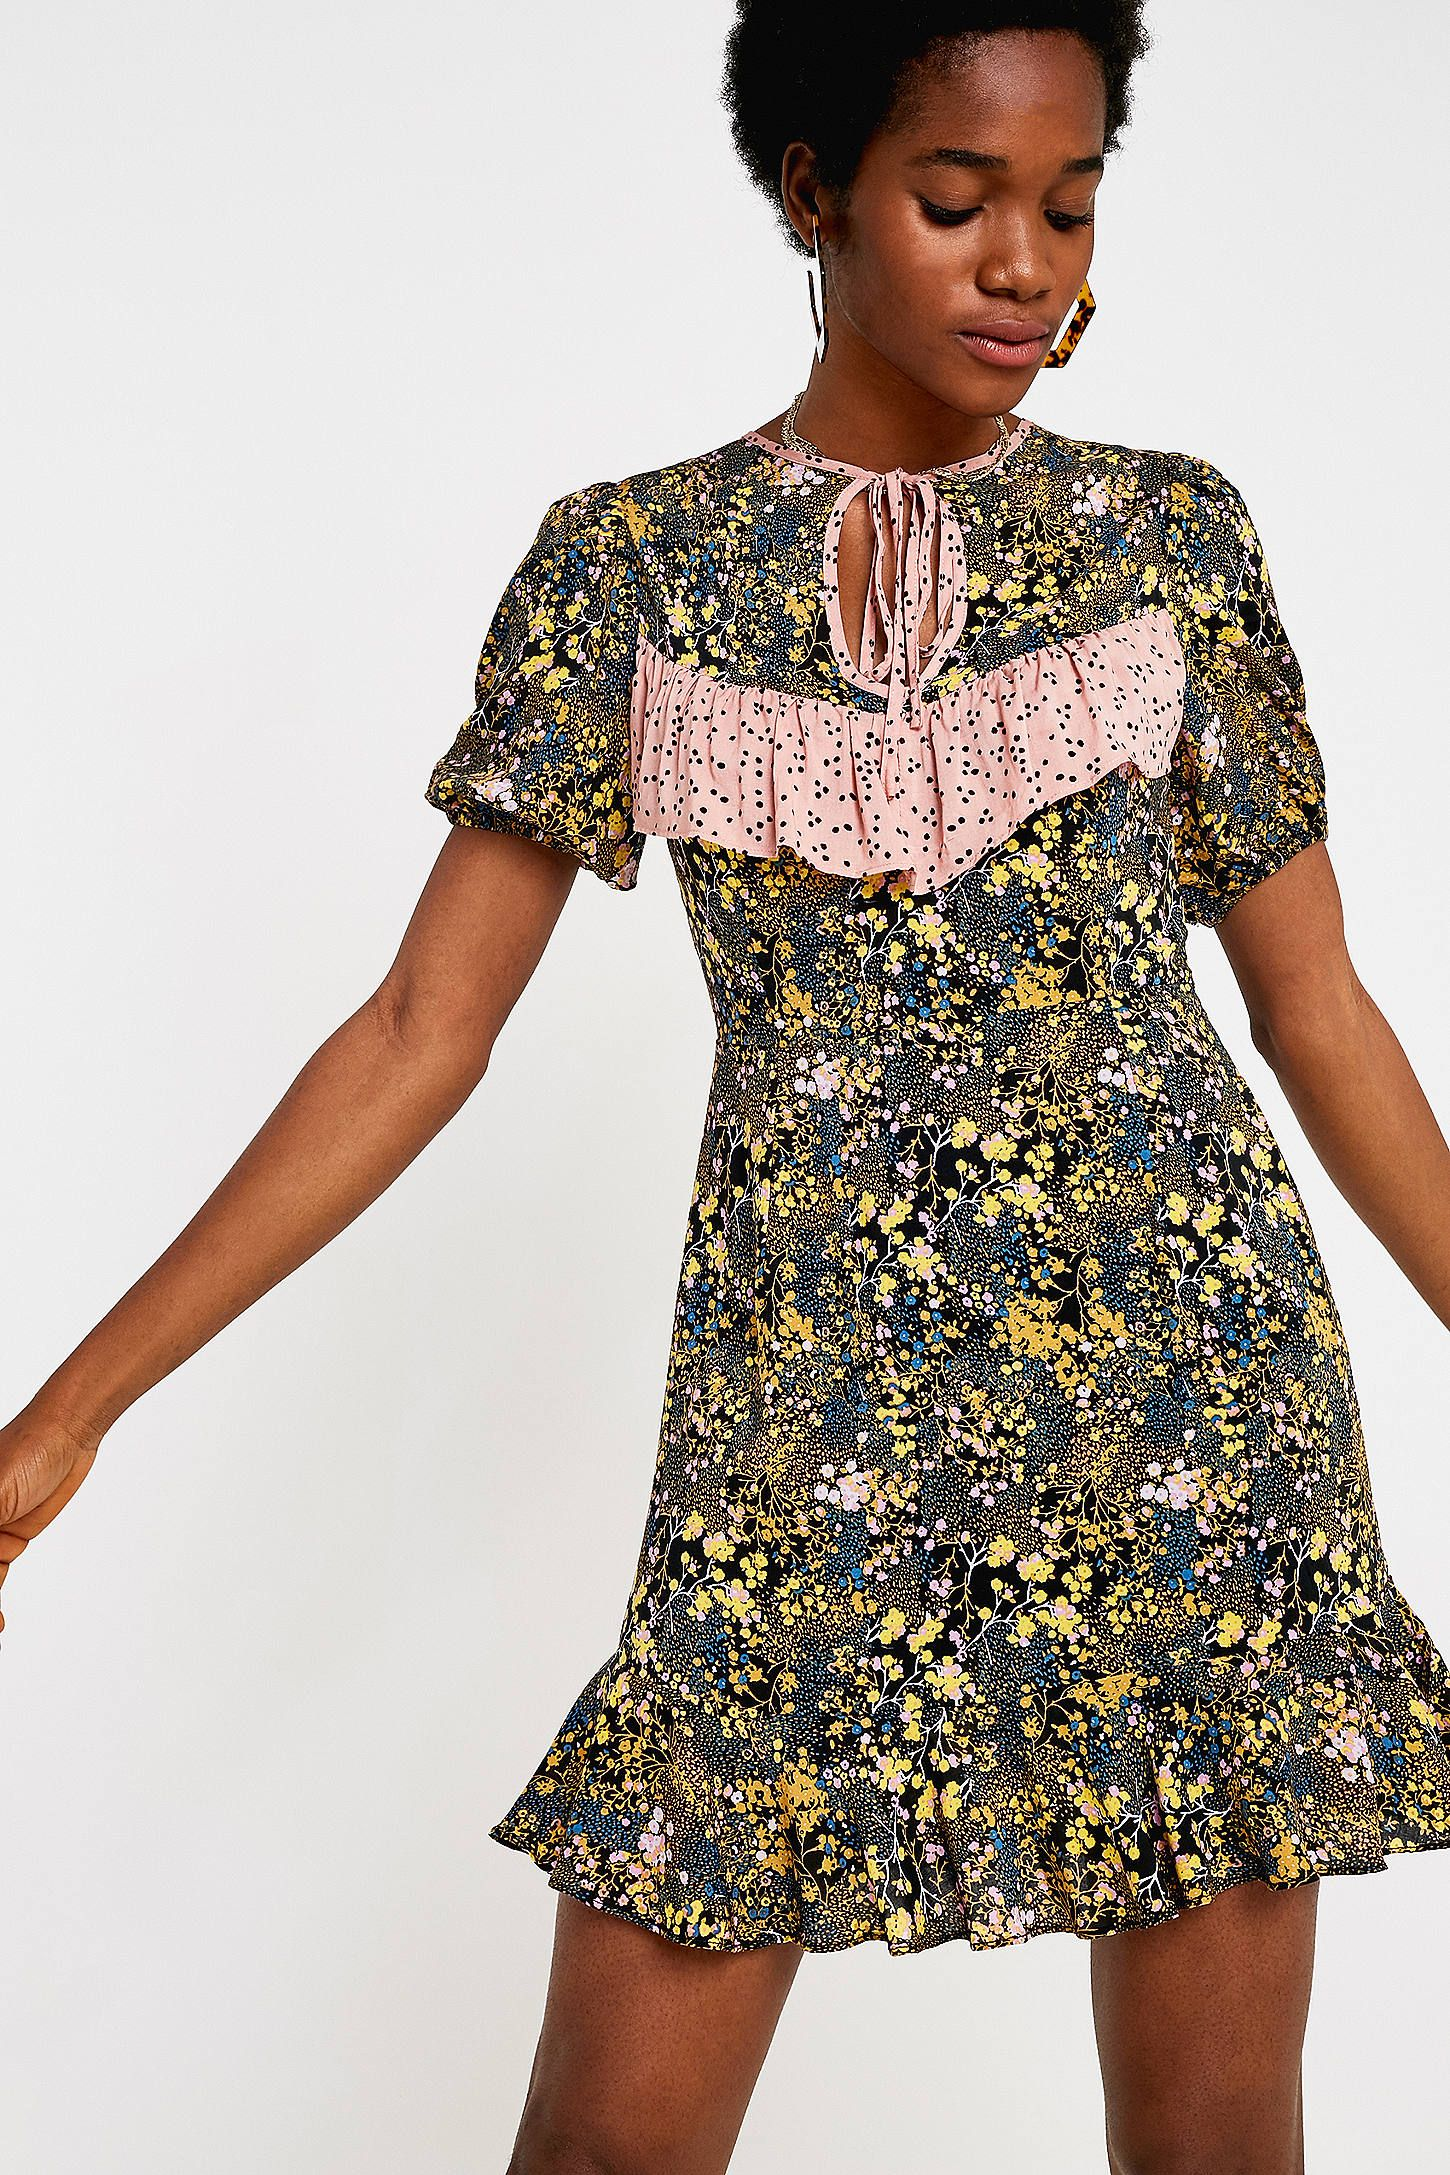 78e9b35c7702b UO Sinclair Floral Puff Sleeve Mini Dress in 2019 | Dresses | Mini ...